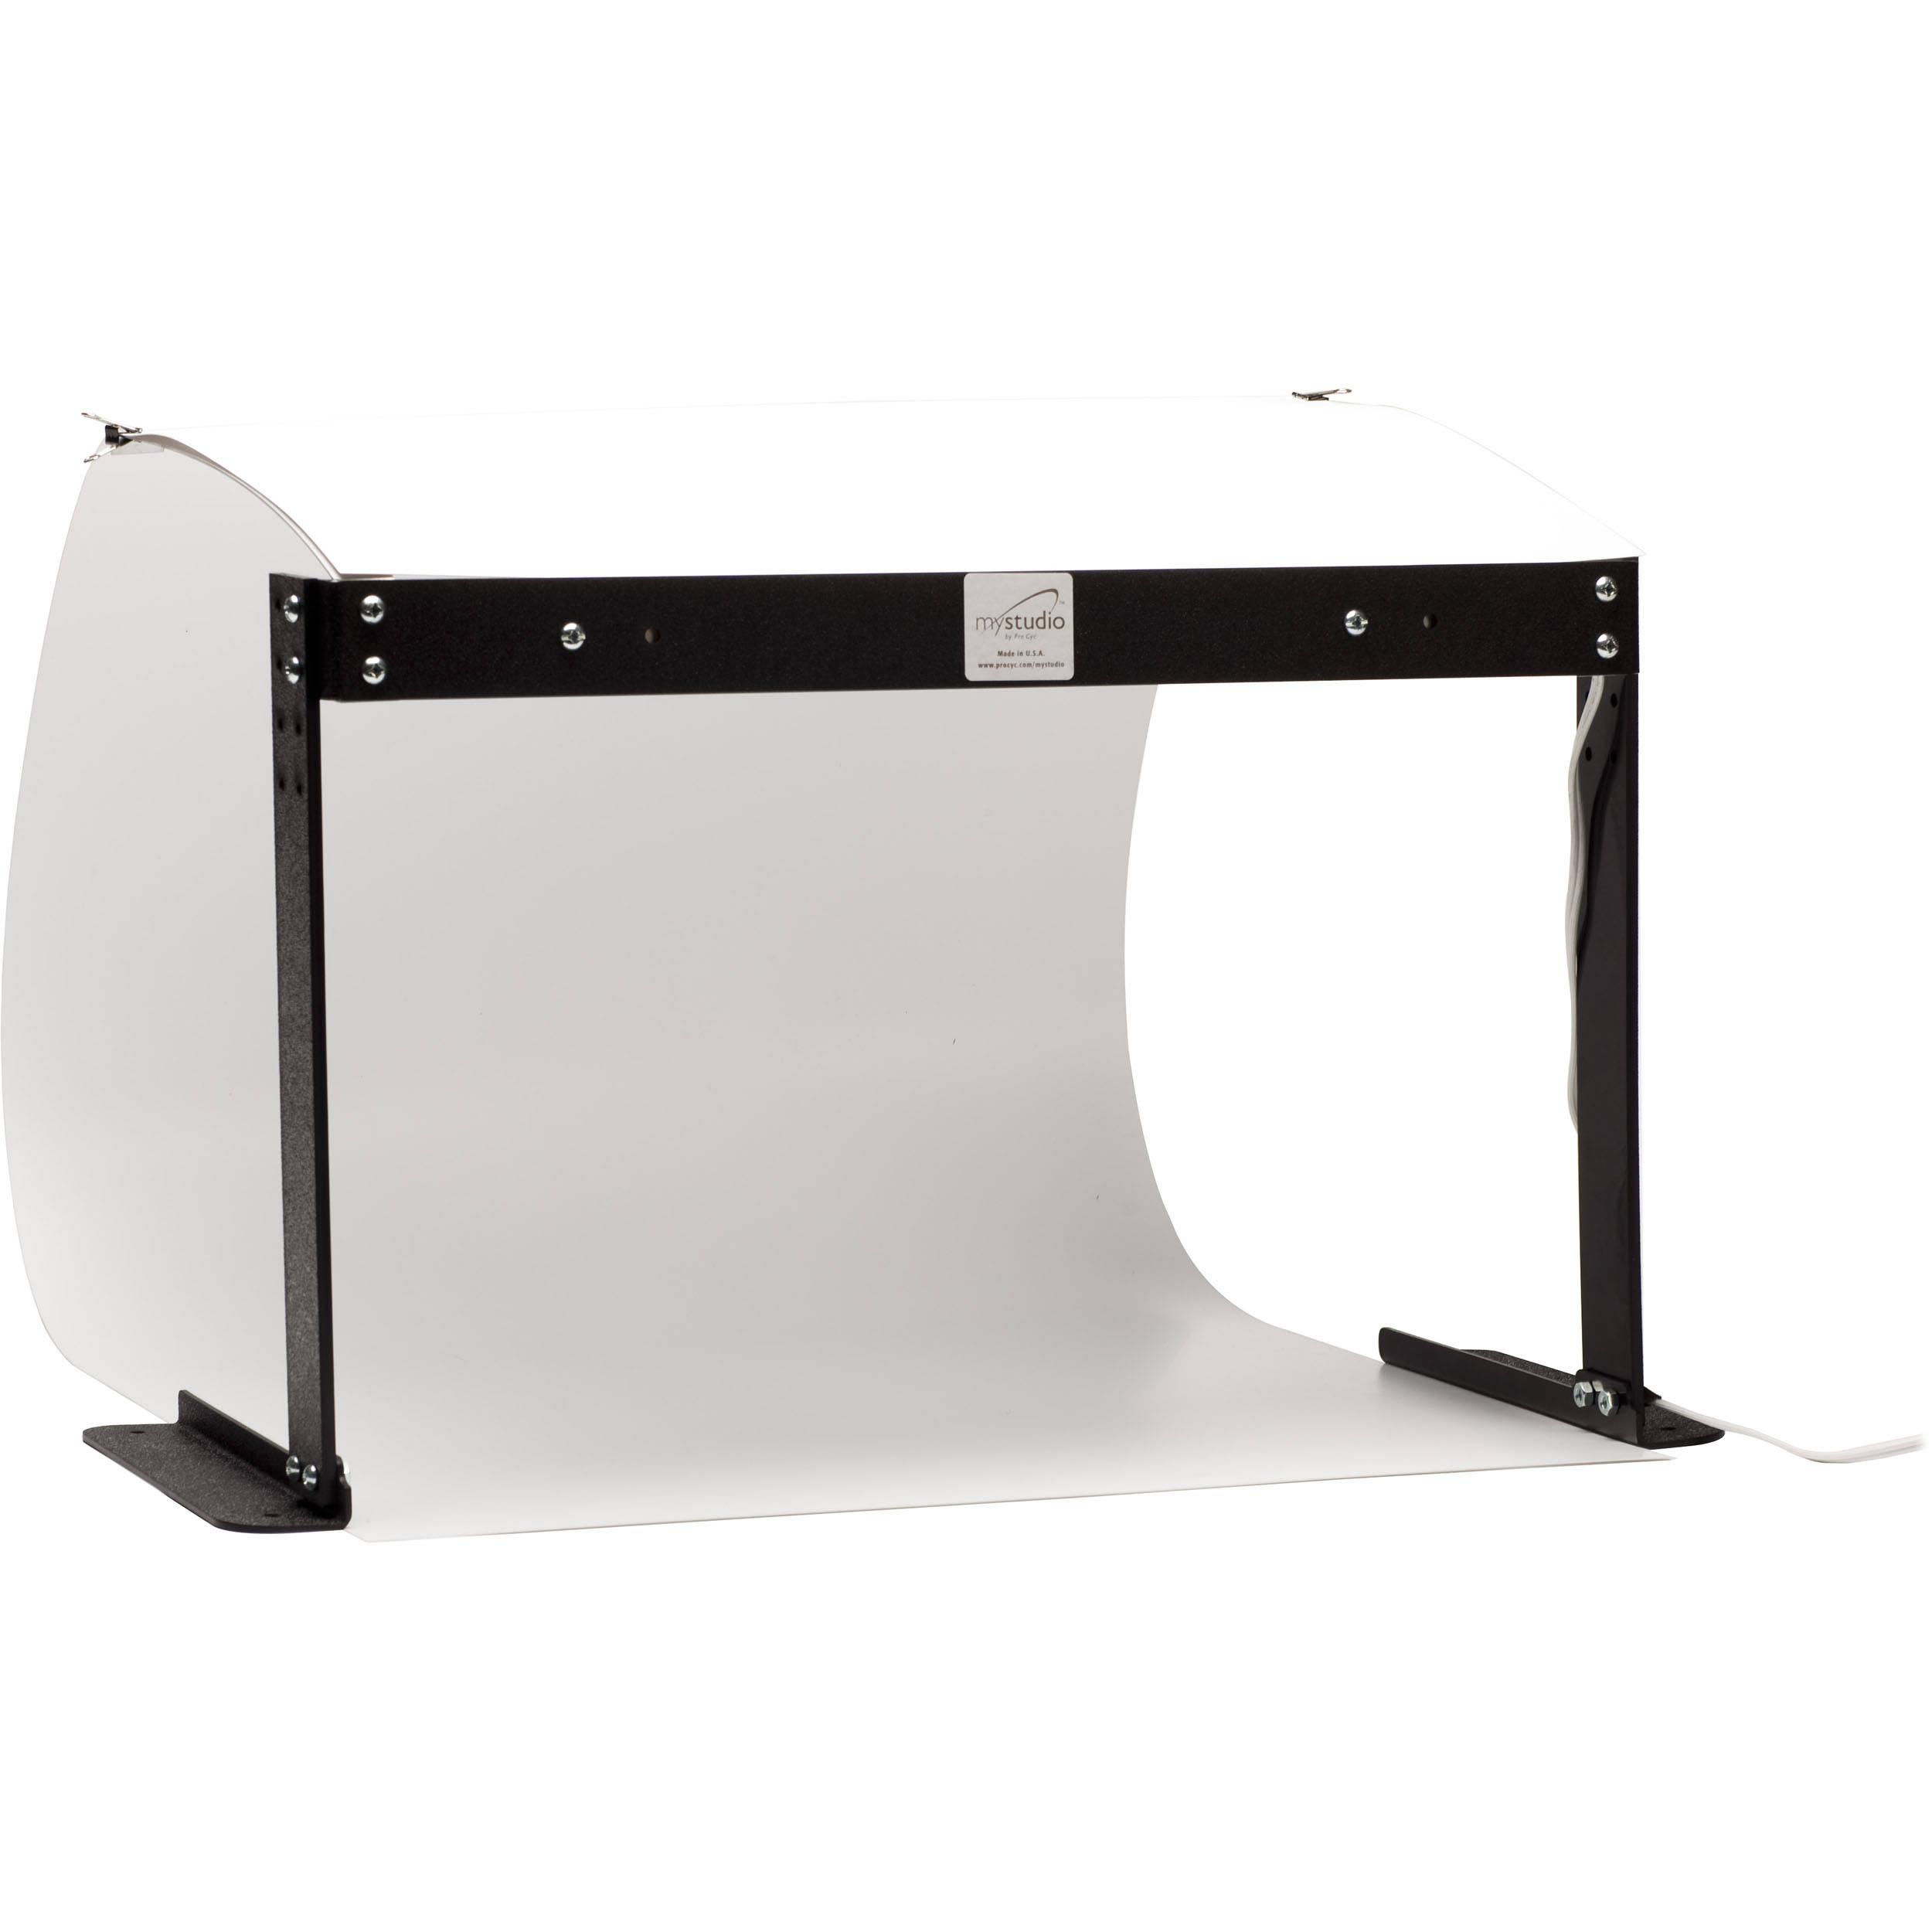 Studio Lighting Kit Amazon: MyStudio PS5 PortaStudio Portable Photo Studio With 5000K PS5